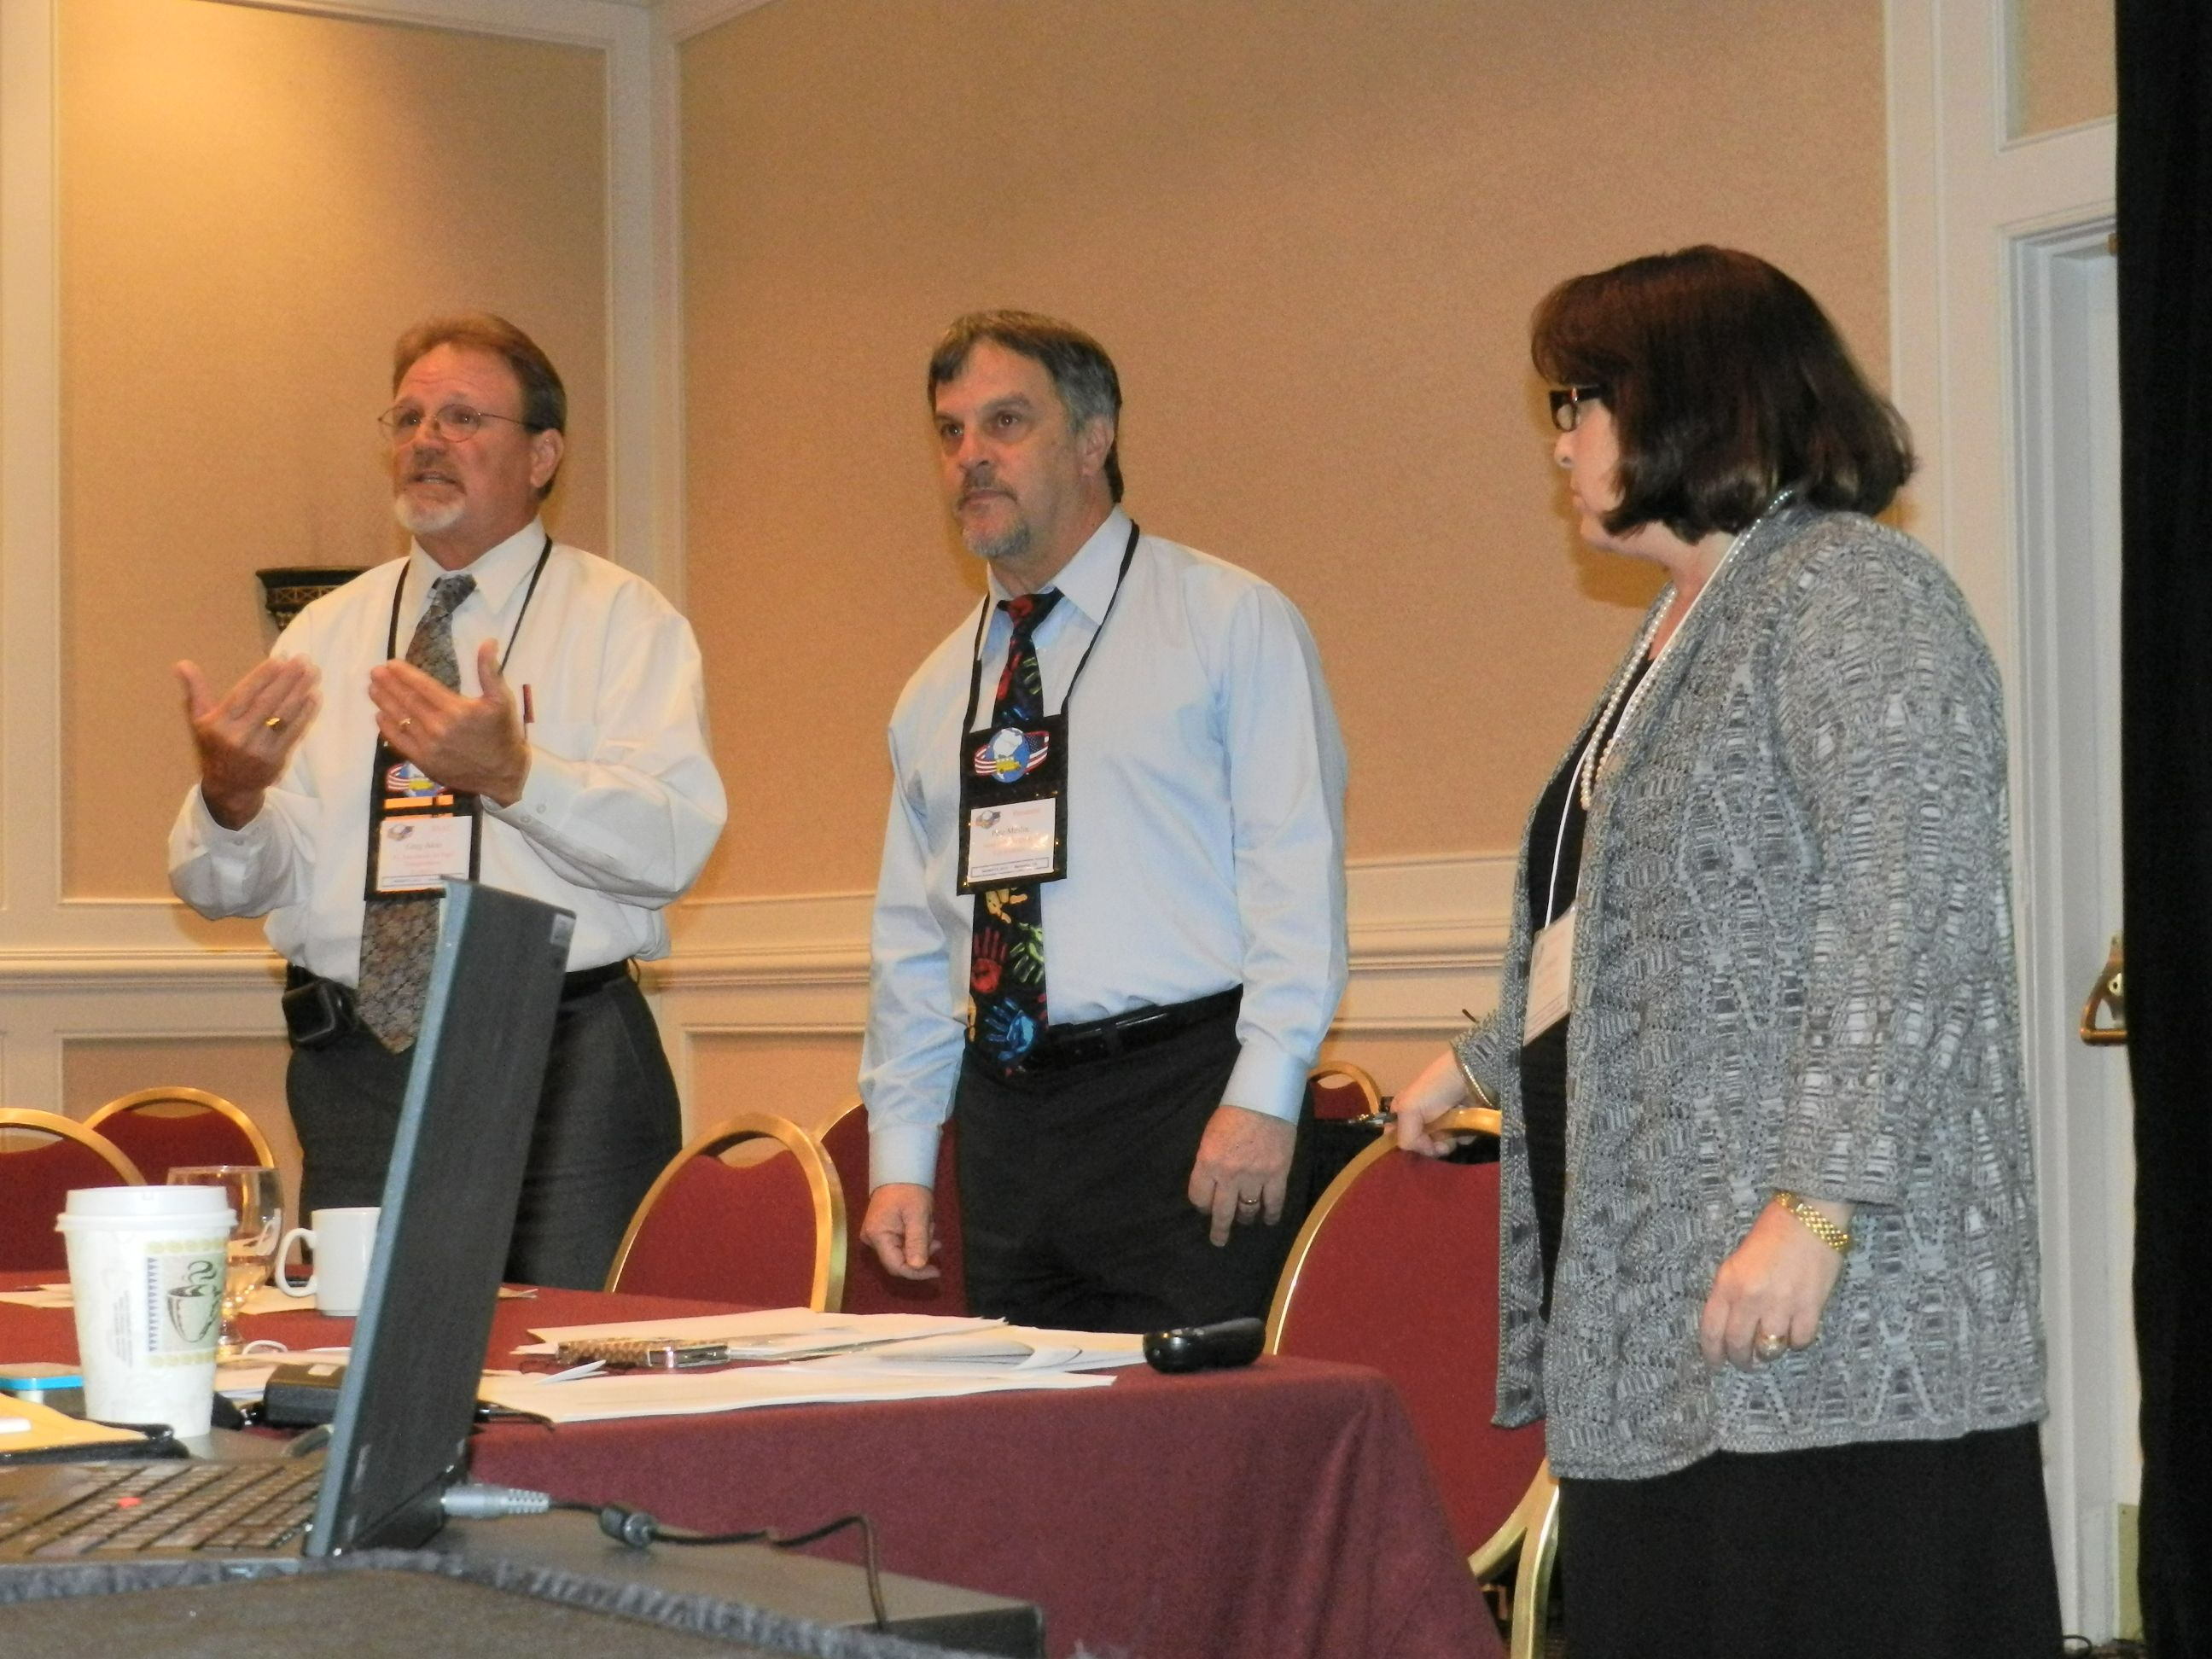 NASDPTS looks at ways to enhance training, service